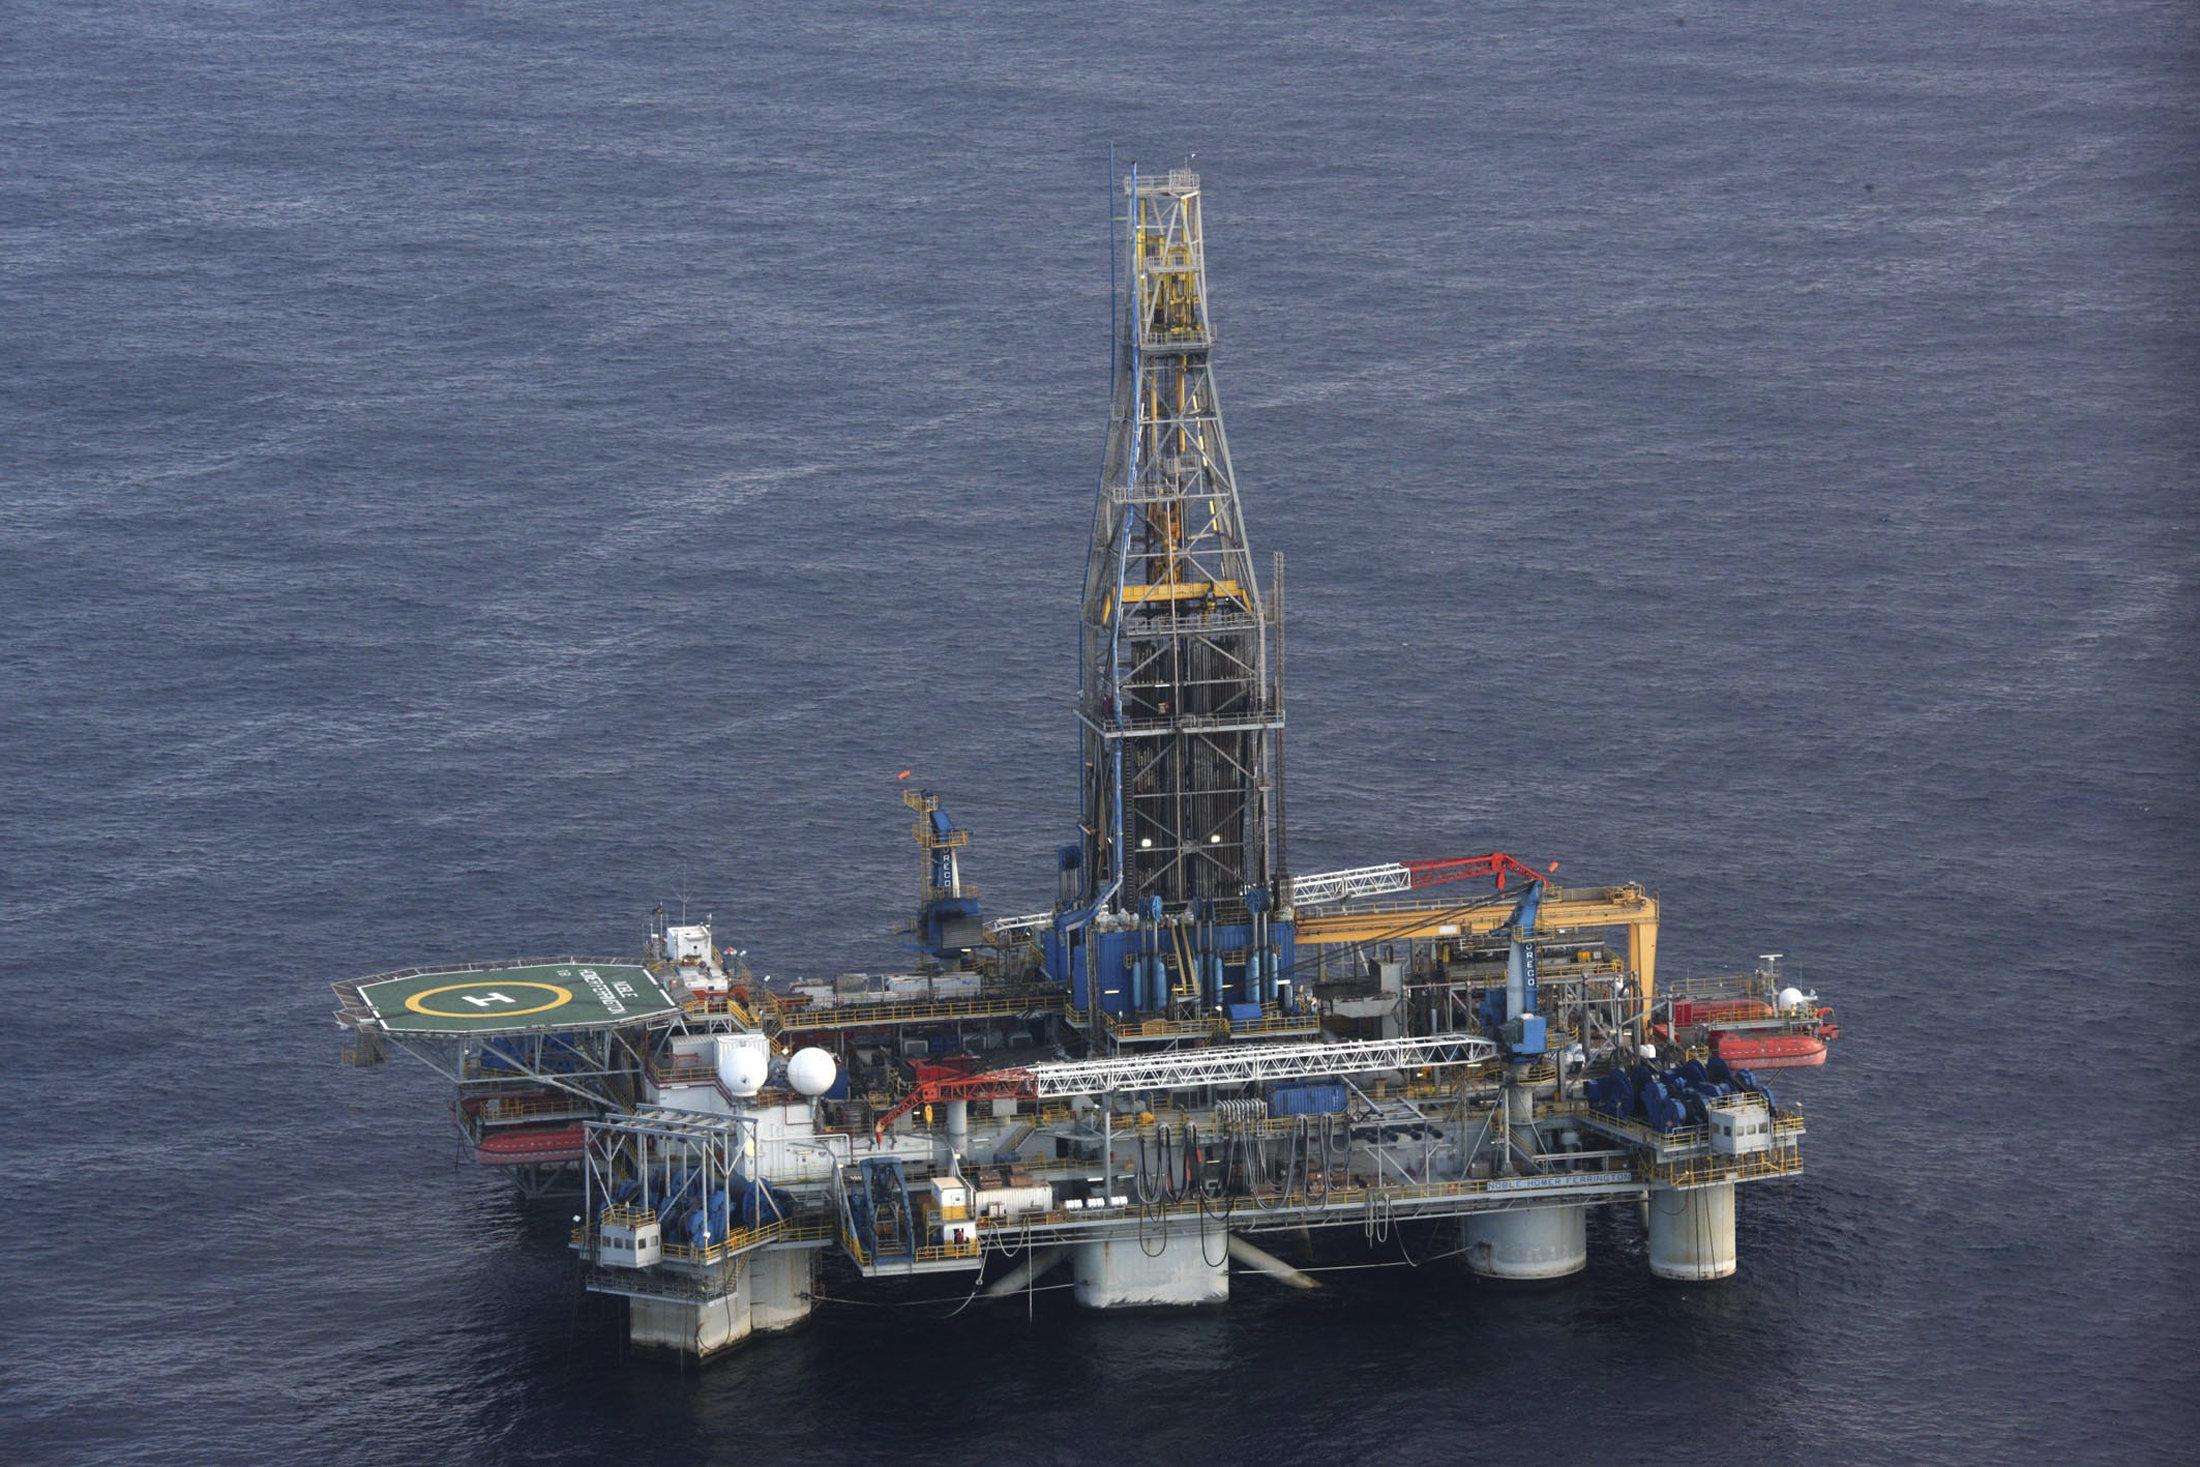 Nέα τουρκική NAVTEX επιχειρεί να σταματήσει τις έρευνες της Exxon Mobil στο οικόπεδο 10 της κυπριακής